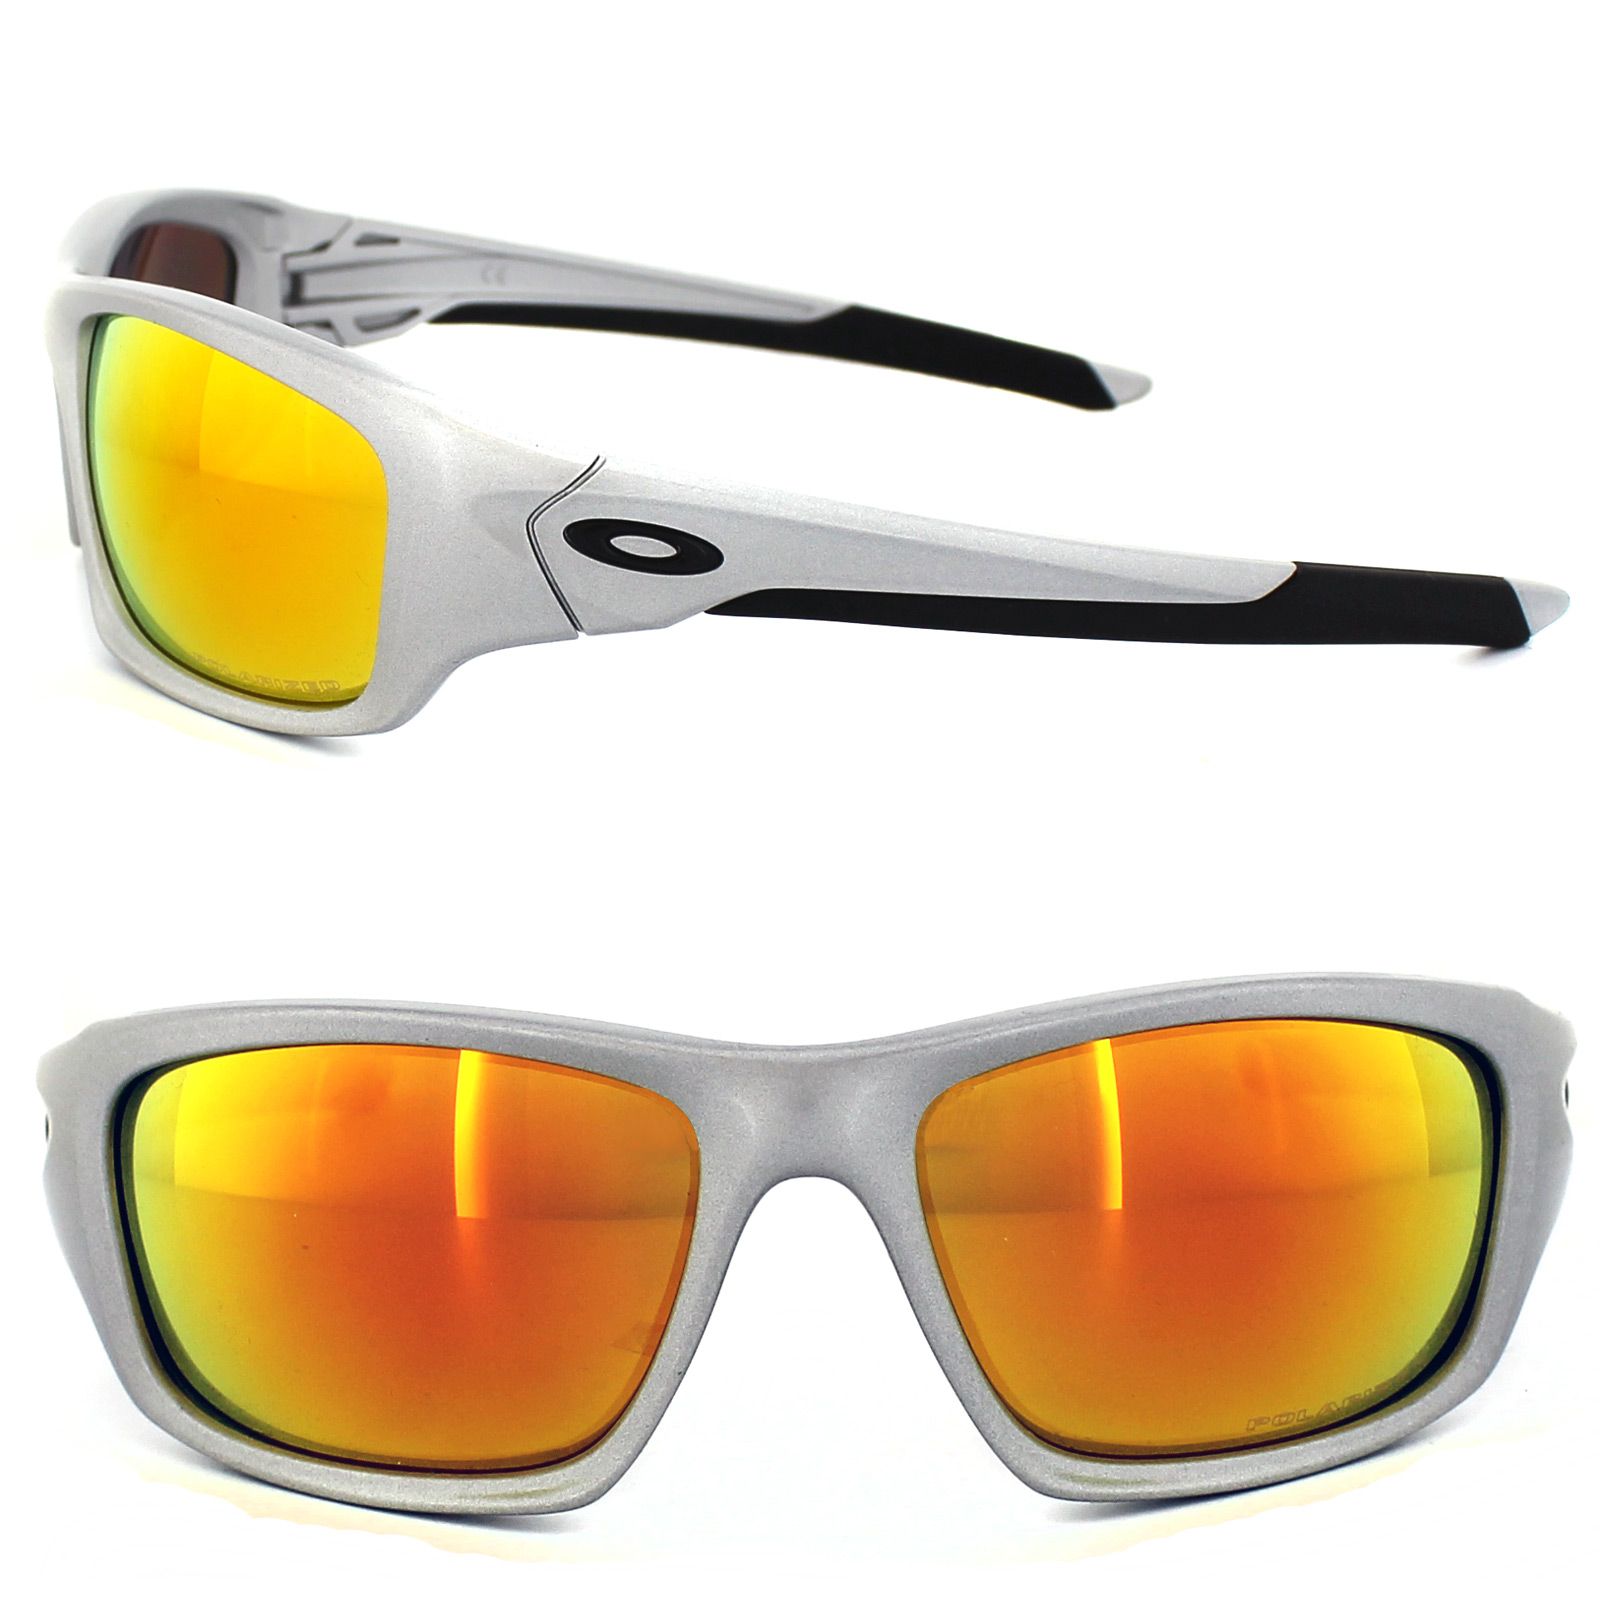 503111f5b9 Sentinel Oakley Sunglasses Valve OO9236-07 Silver Fire Iridium Polarized